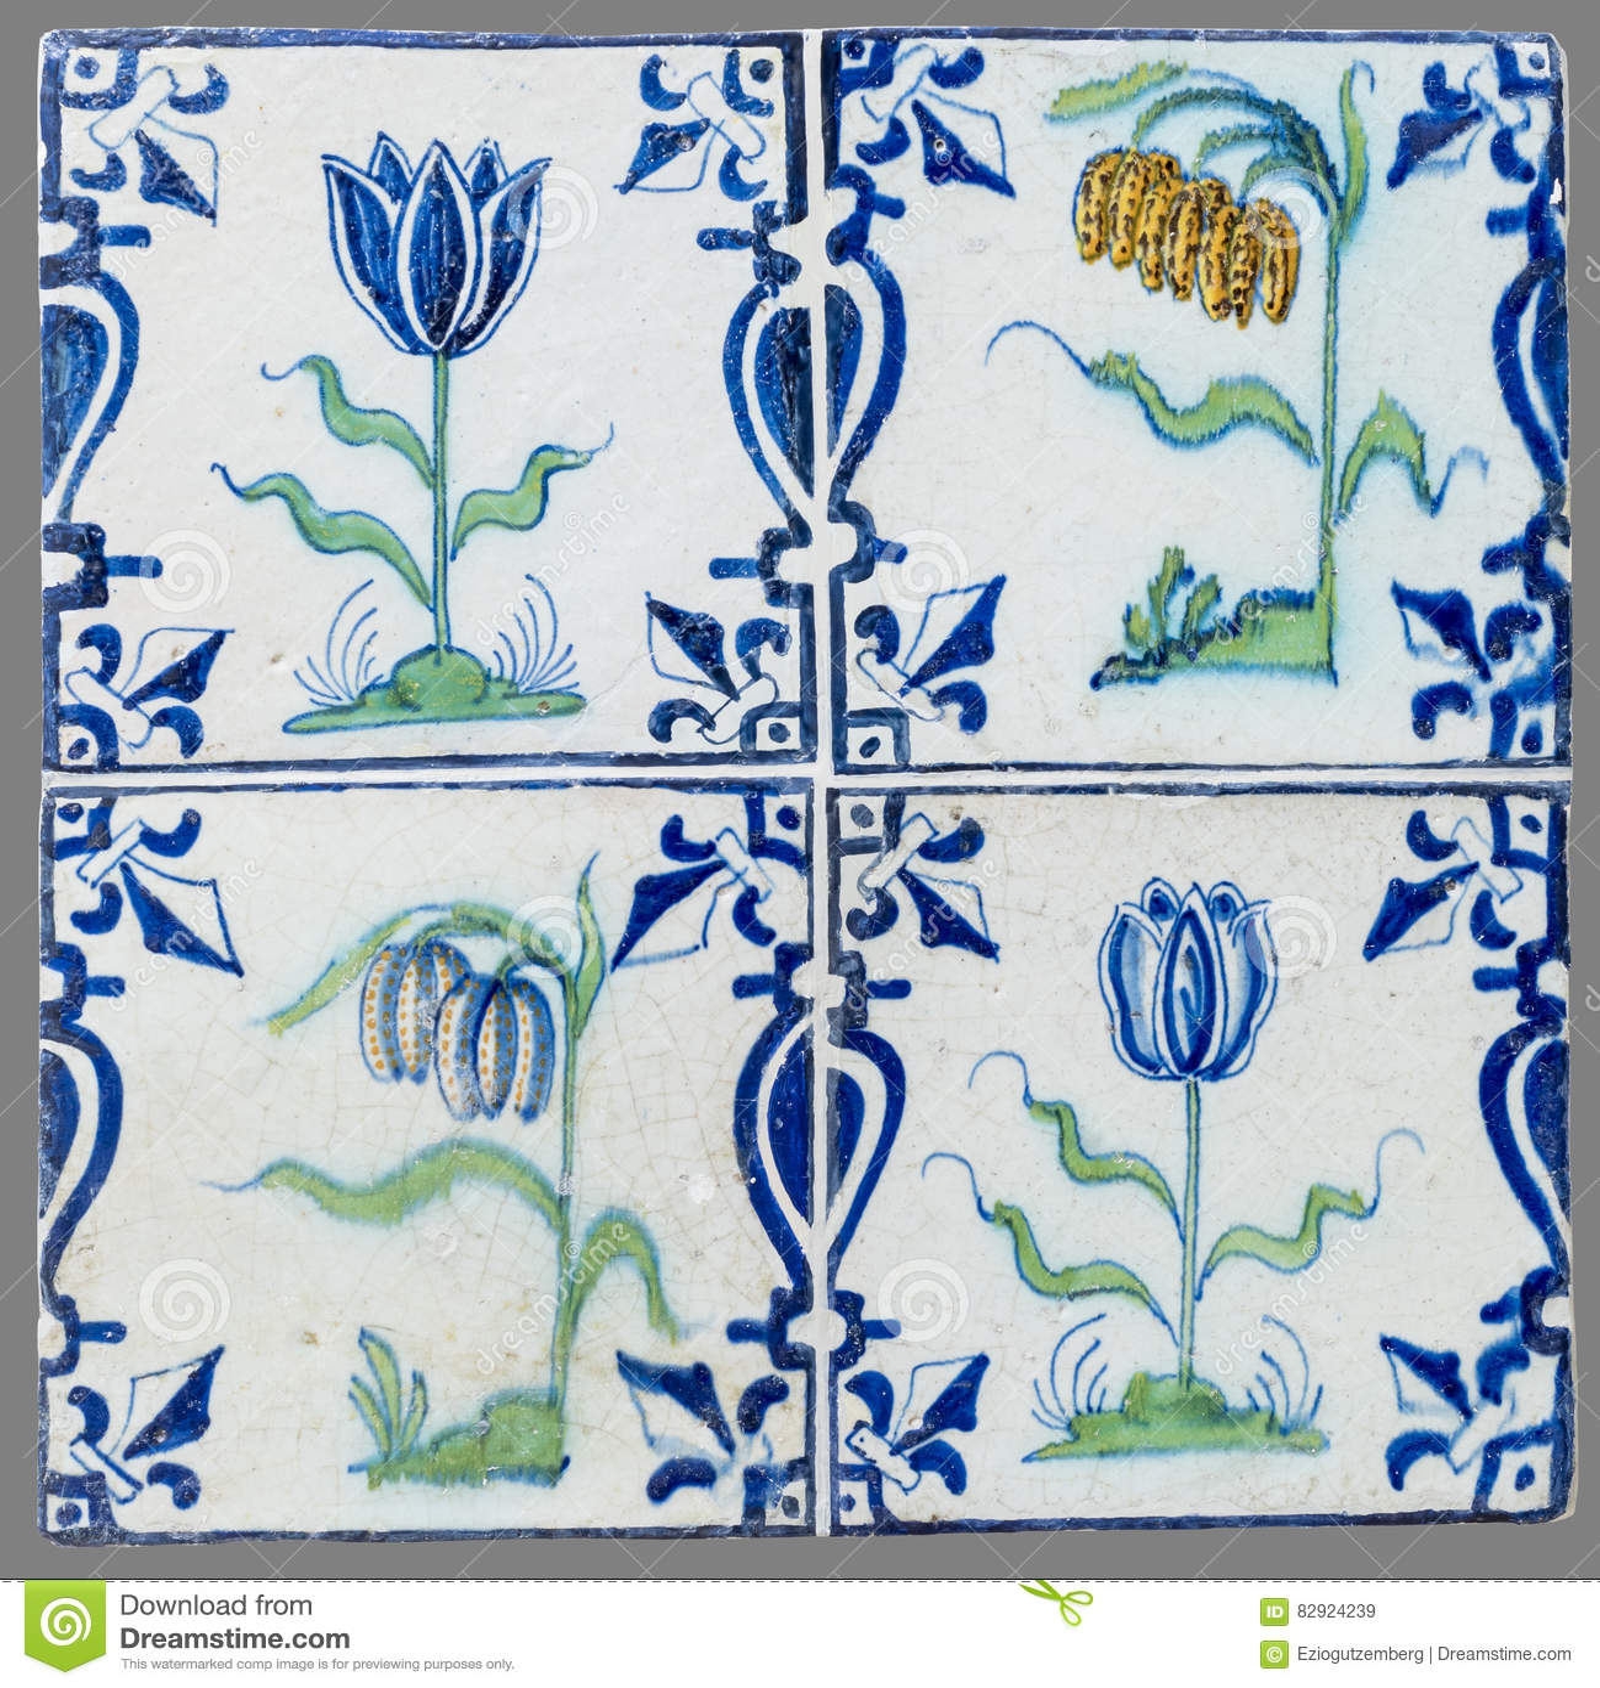 Telha holandesa do 16a ao século XVIII